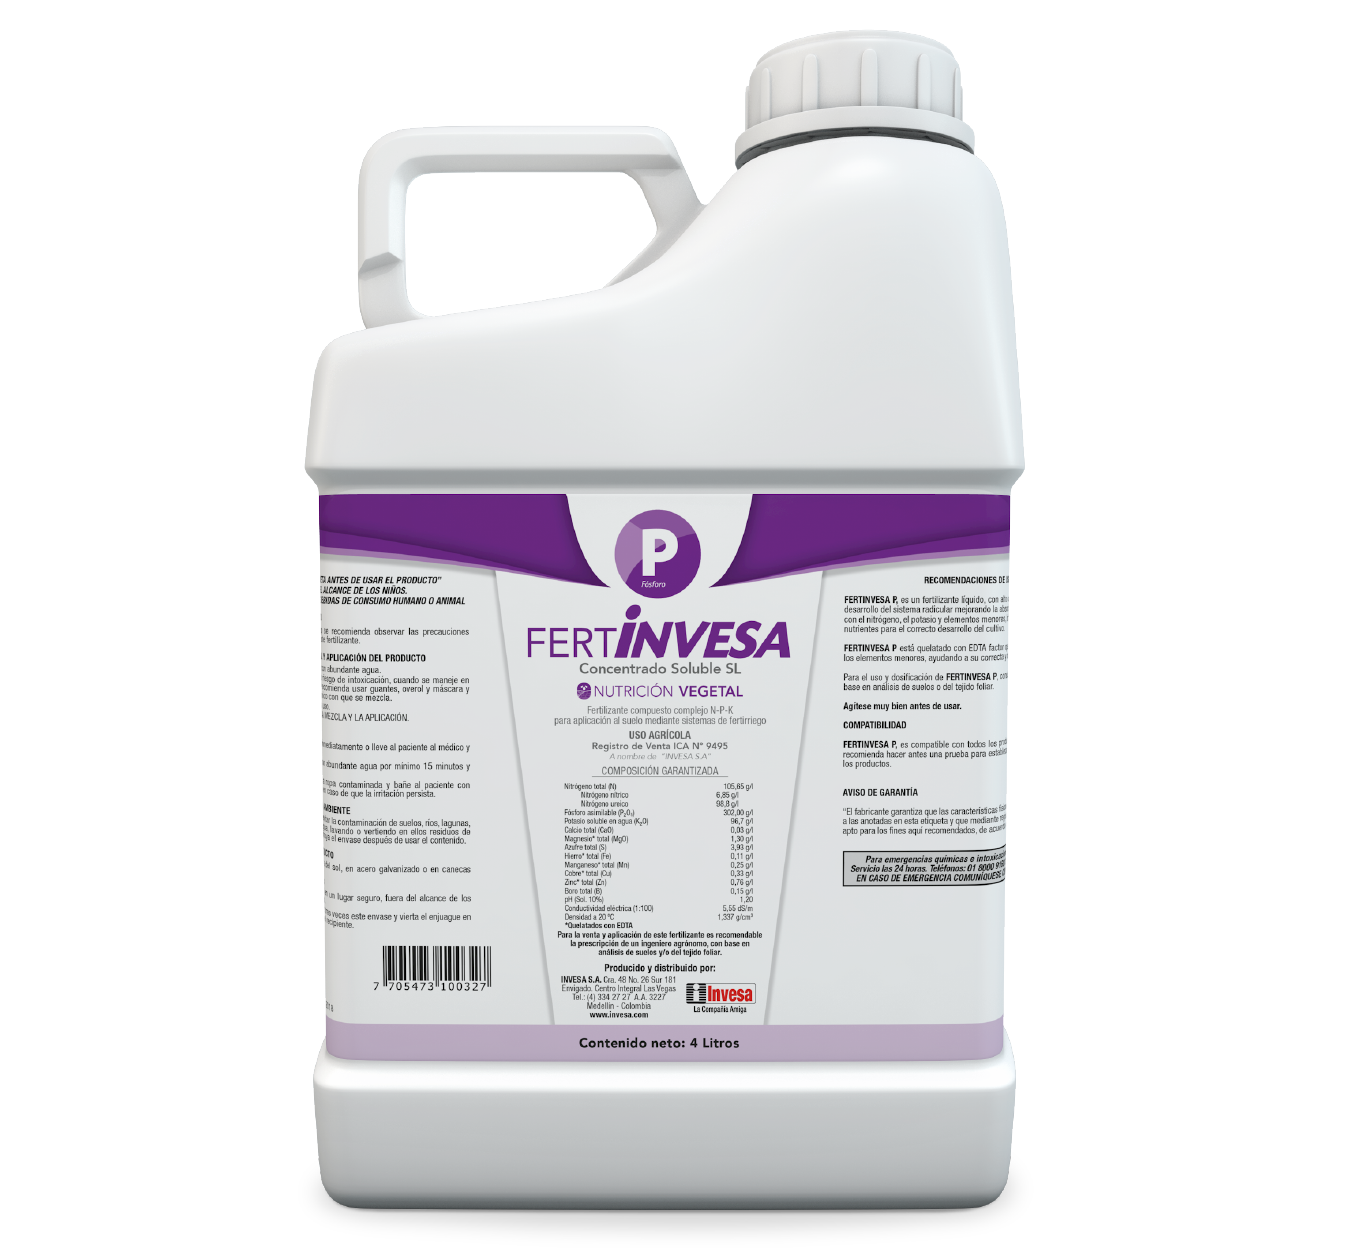 Fertilizante fertinvesa p invesa 4 litros